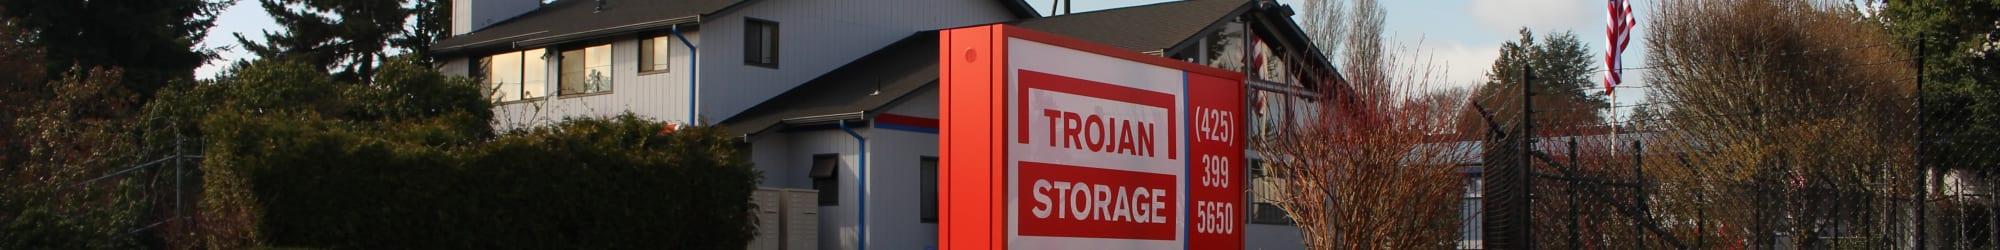 Contact us today at Trojan Storage in Everett, Washington